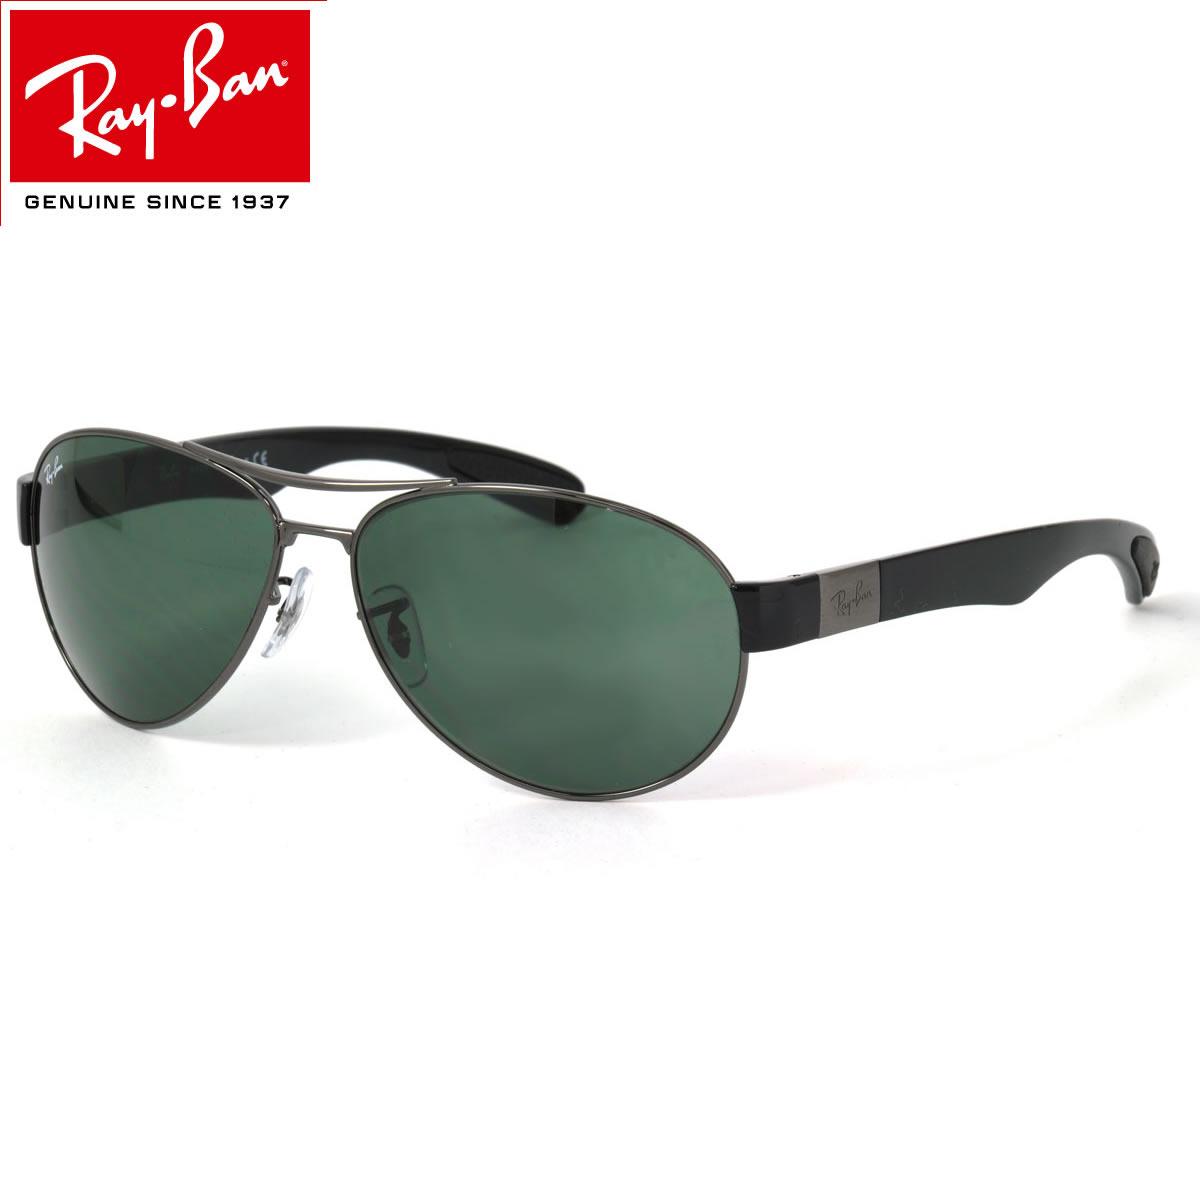 cf6d708d97c Optical Shop Thats  Ray-Ban Sunglasses RB3509 004 71 63size GENUINE ...